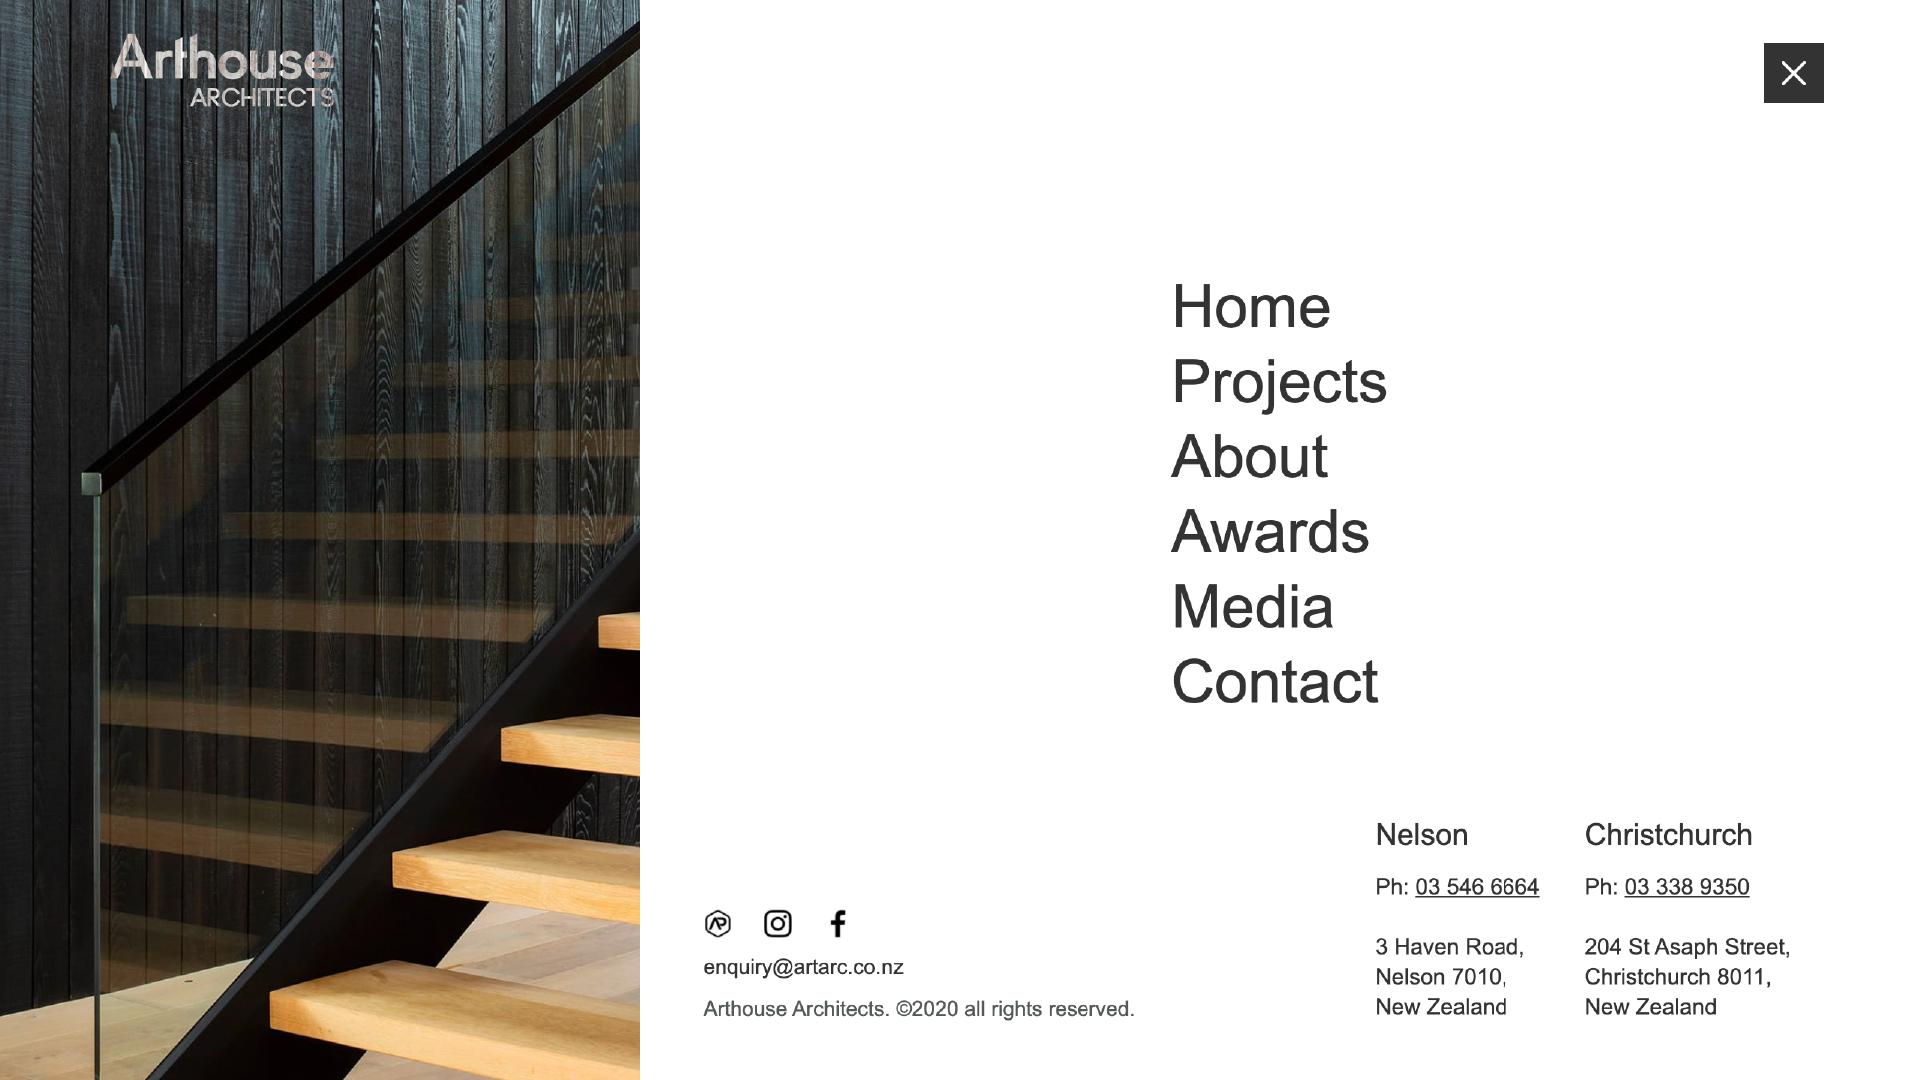 attraction studio arthouse architects brand web desktop navigation